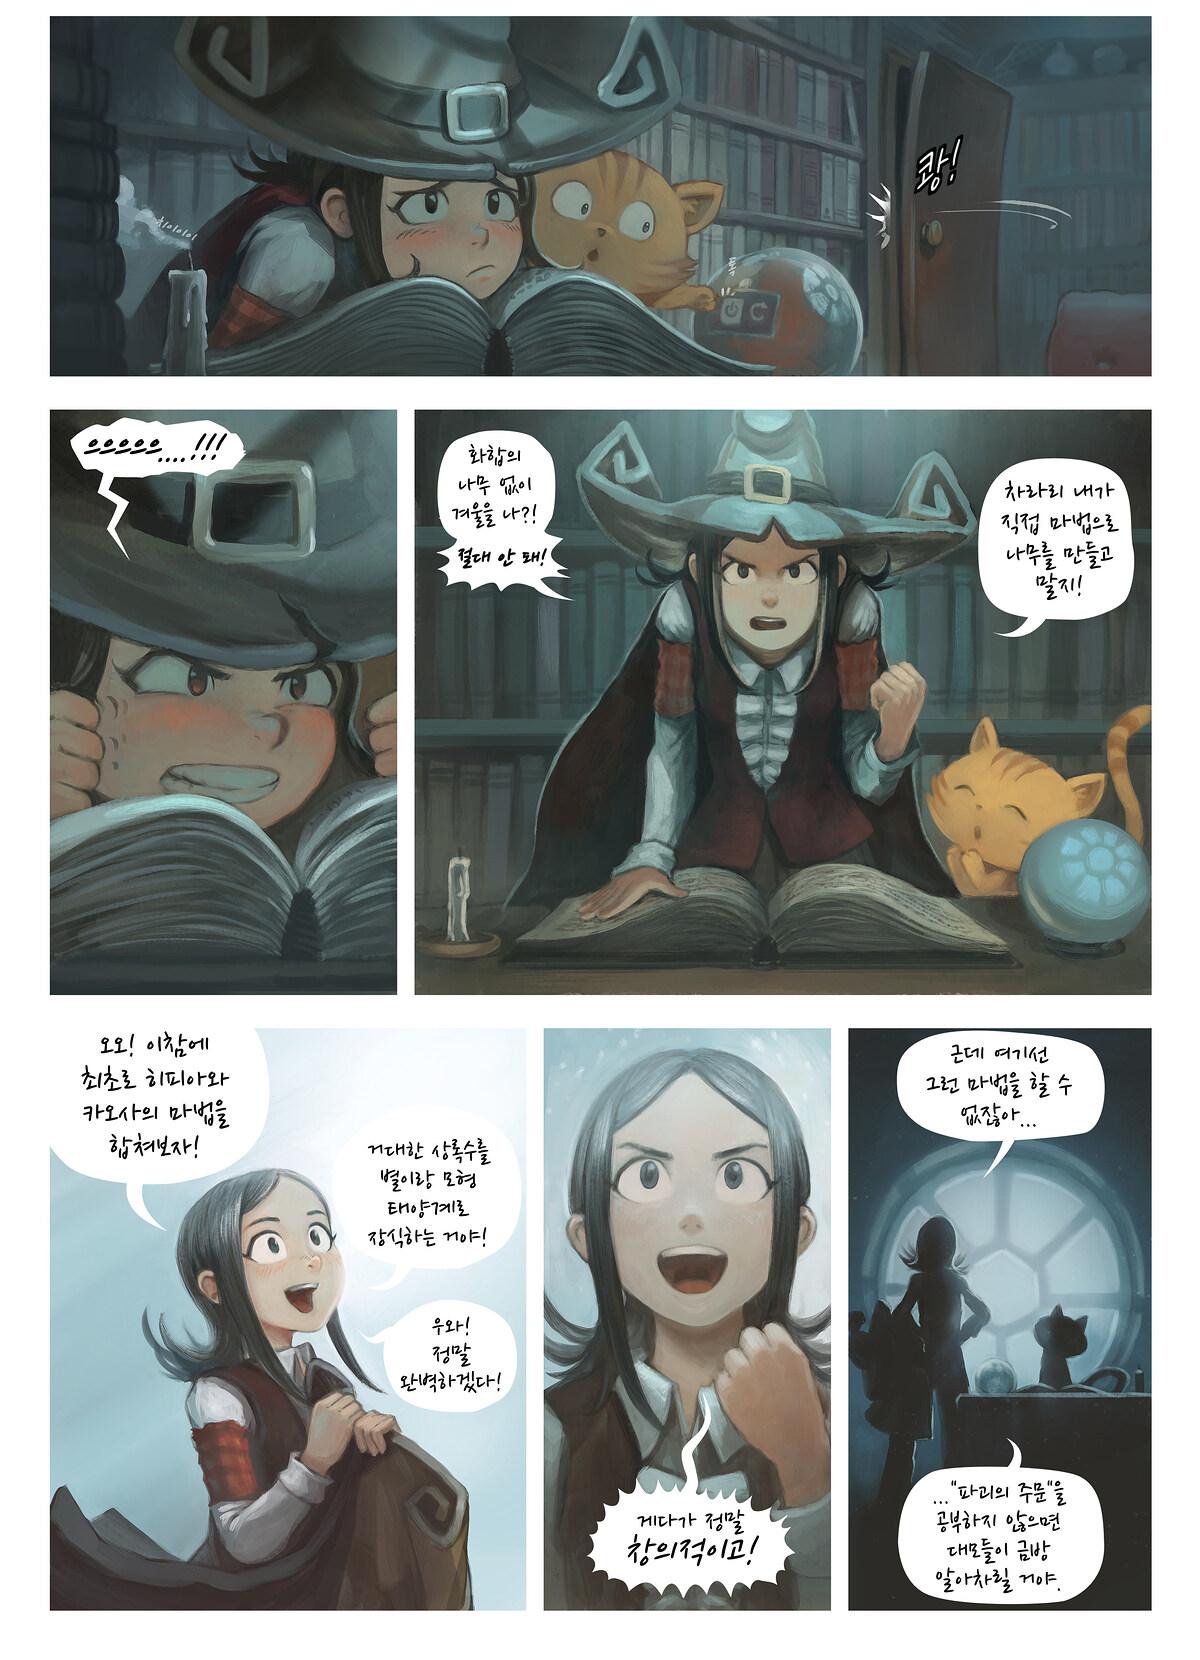 A webcomic page of Pepper&Carrot, 에피소드 24 [kr], 페이지 2